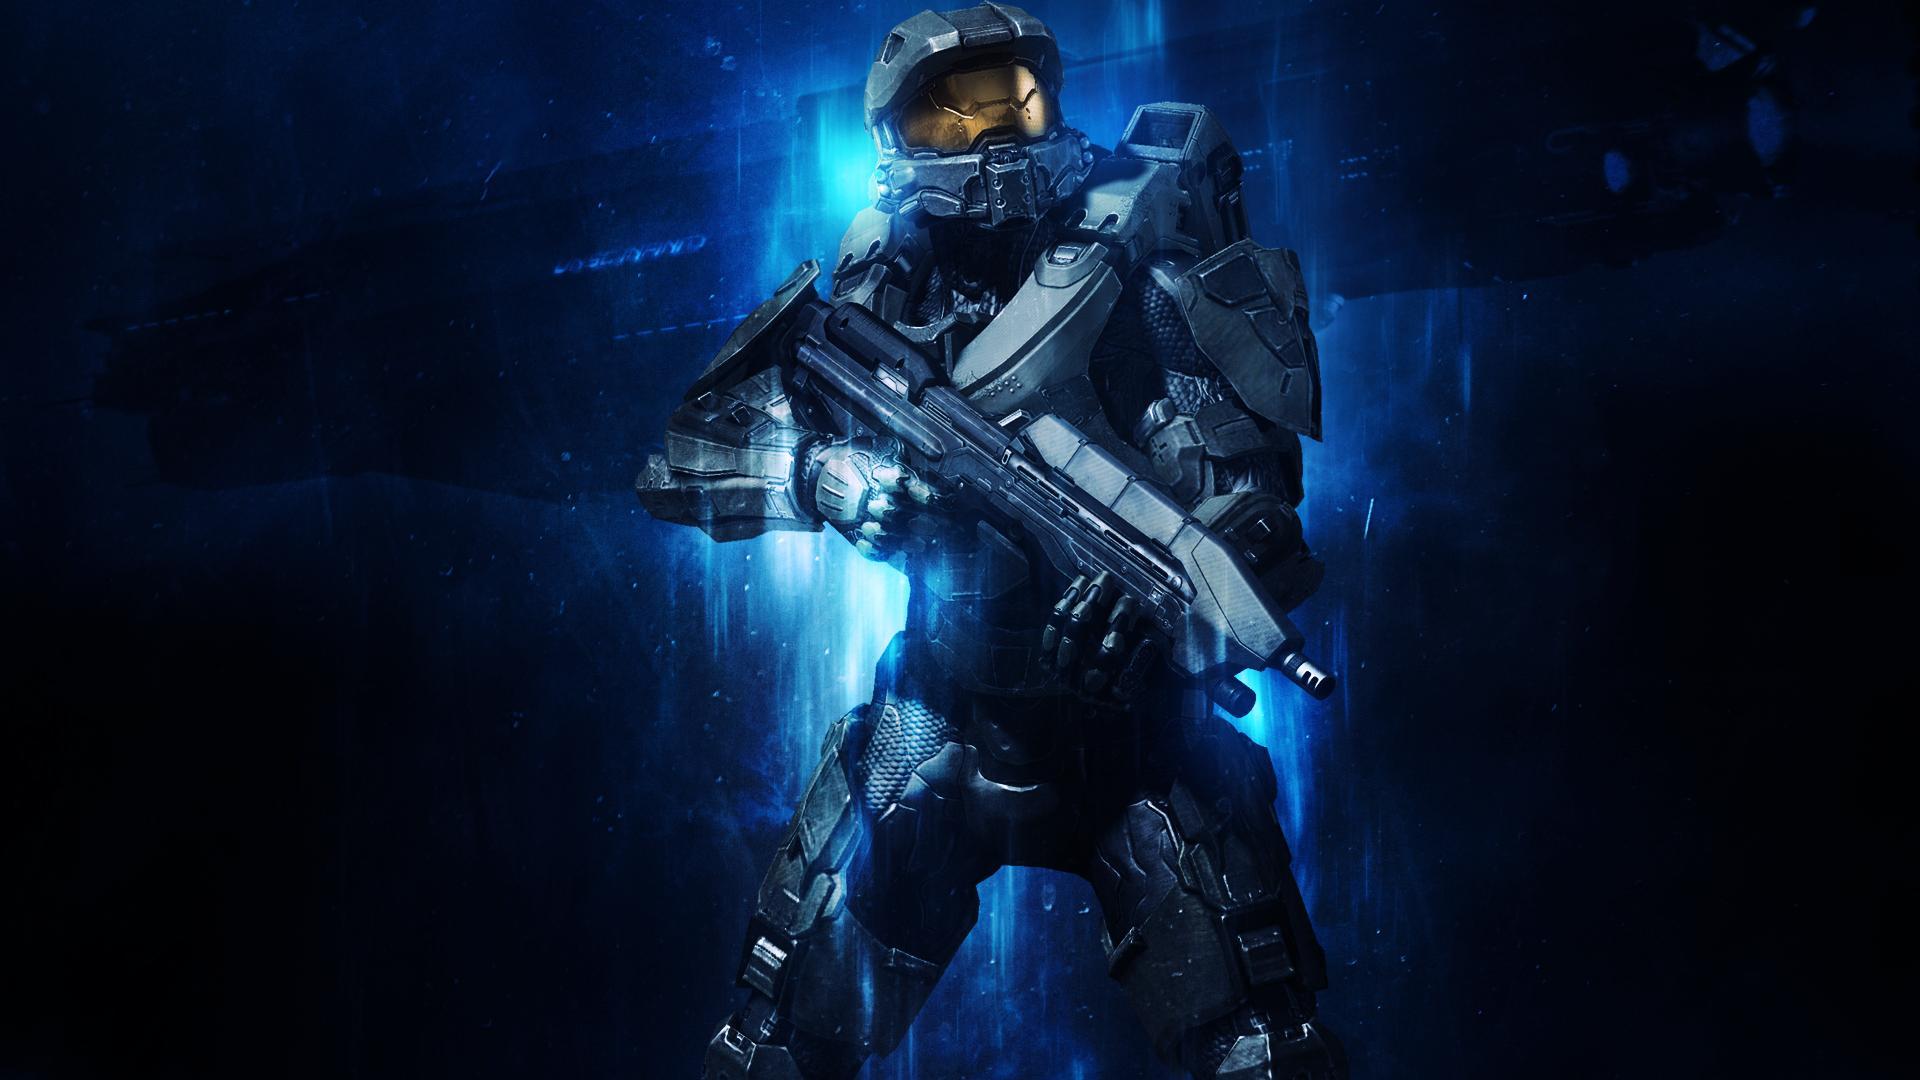 Halo 5 игра  № 2310763 бесплатно